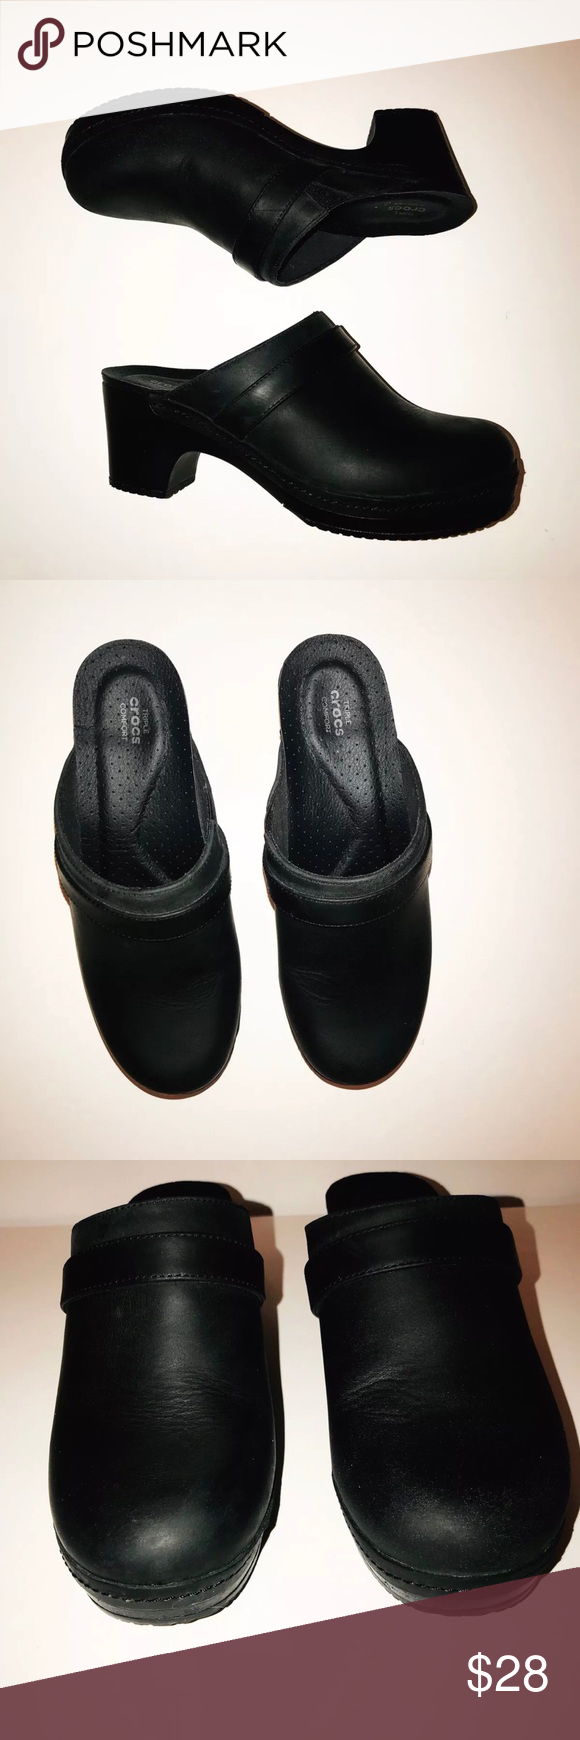 6242fa0994 CROCS Sarah Mule Clogs Nursing Comfort Black Sz W7 Crocs Sarah women's  pre-owned sz W7. **some minor scuffs in the toe area please see pictures CROCS  Shoes ...